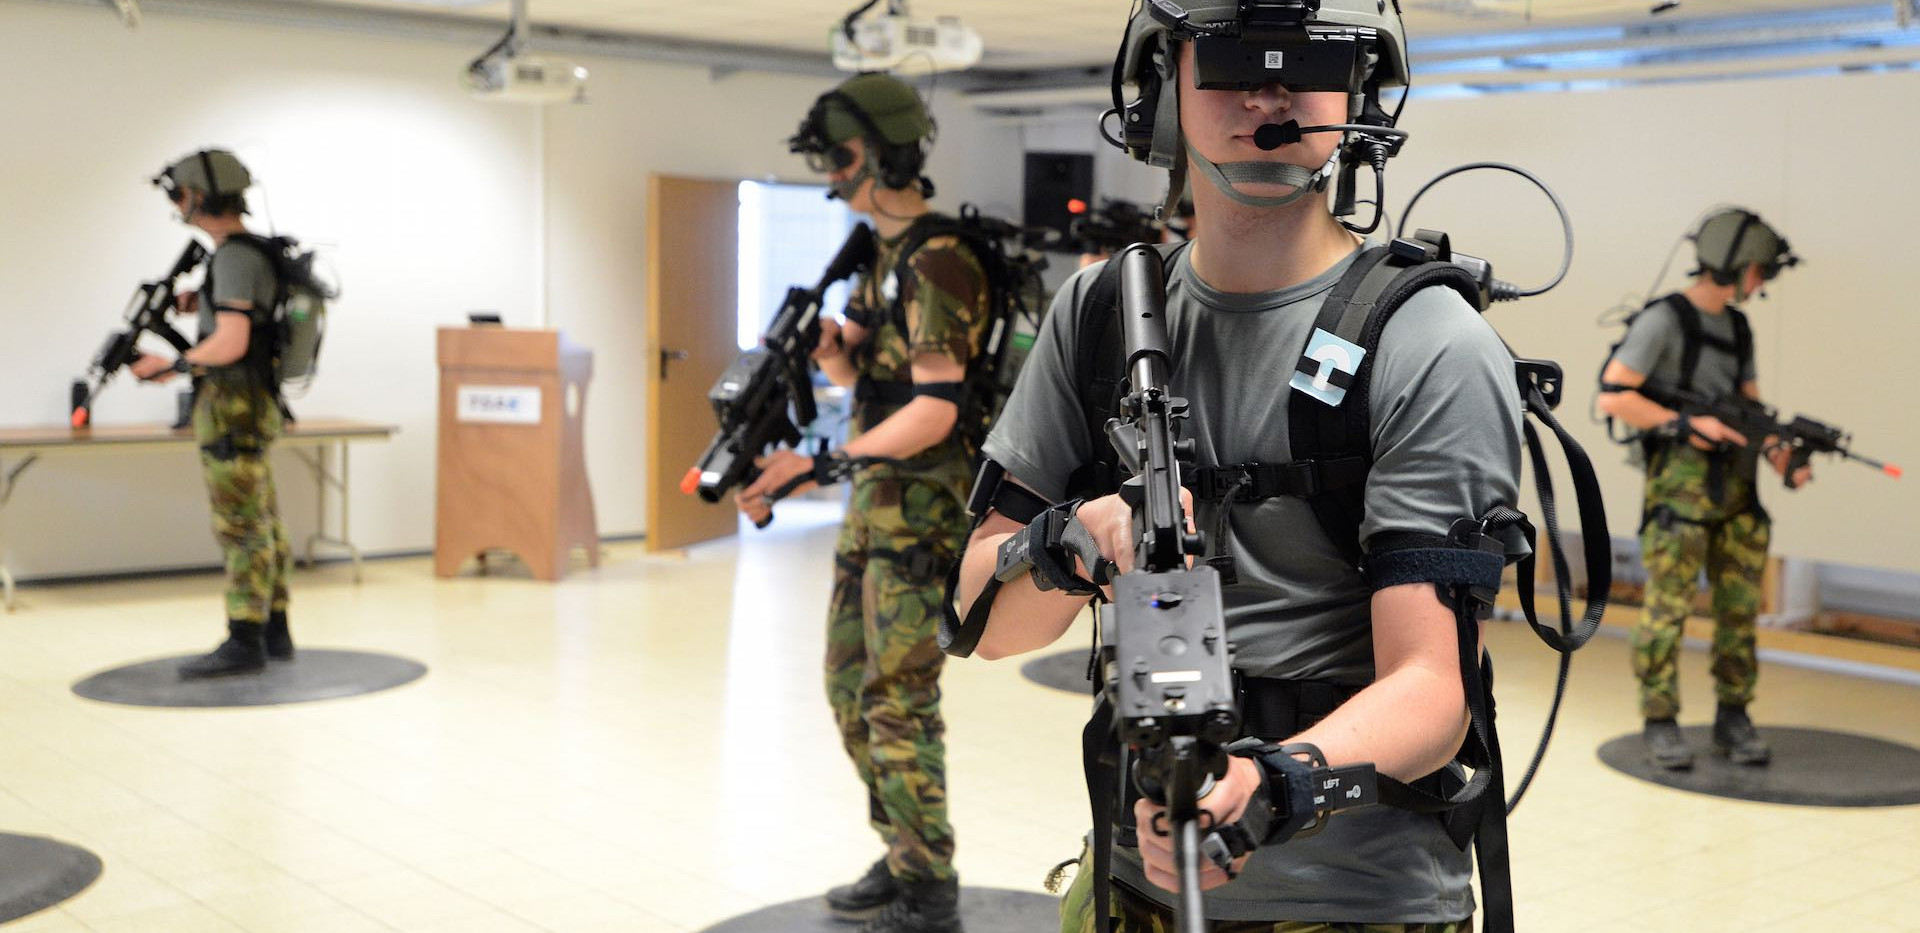 Dismounted Soldier Program